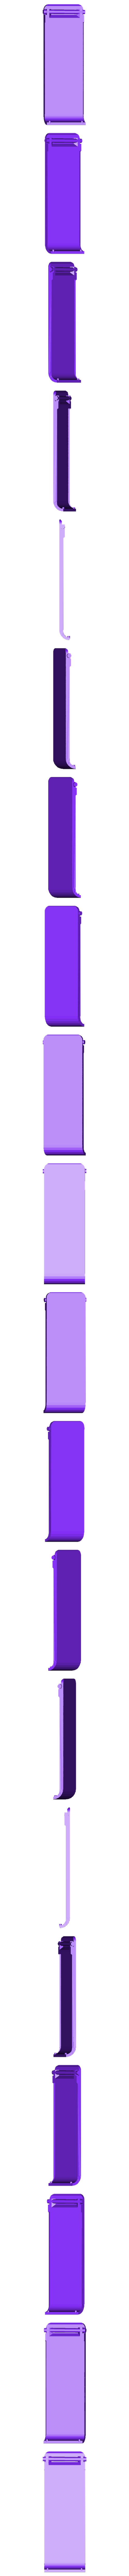 nintendo_switch_kickstand_remix.stl Download free STL file nintendo switch kickstand remix (more durable) • 3D printing object, deadfaith11